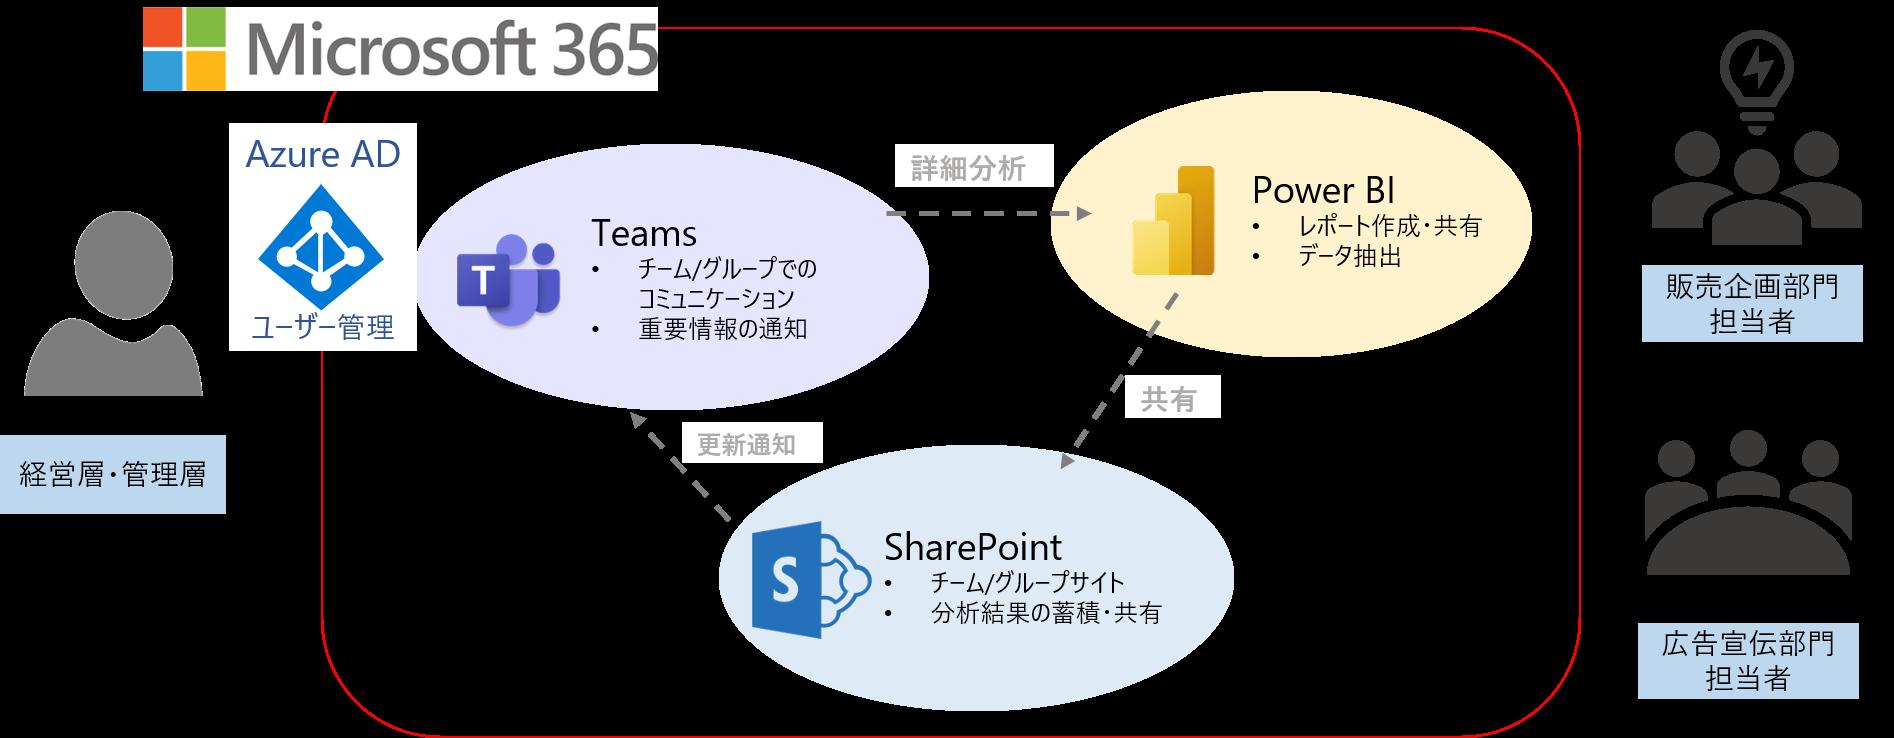 Power BIとMicrosoft 365サービスによる分析プラットフォーム